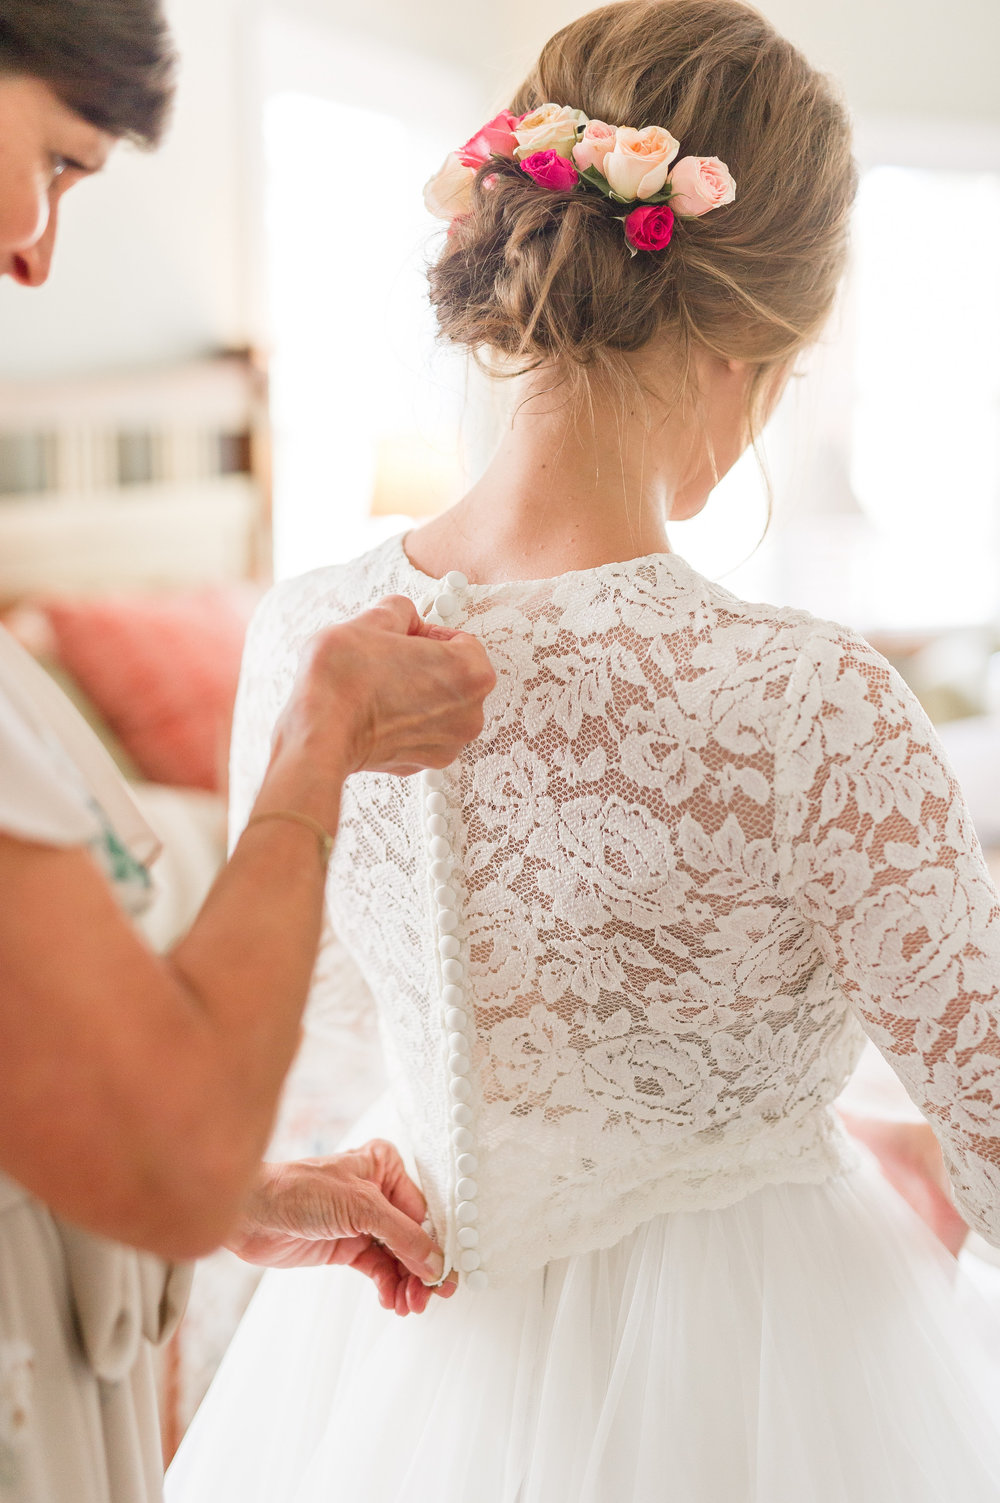 Joe Kendall Romantic Boho Wedding Gulf Shores AL-Getting Ready-0144.jpg